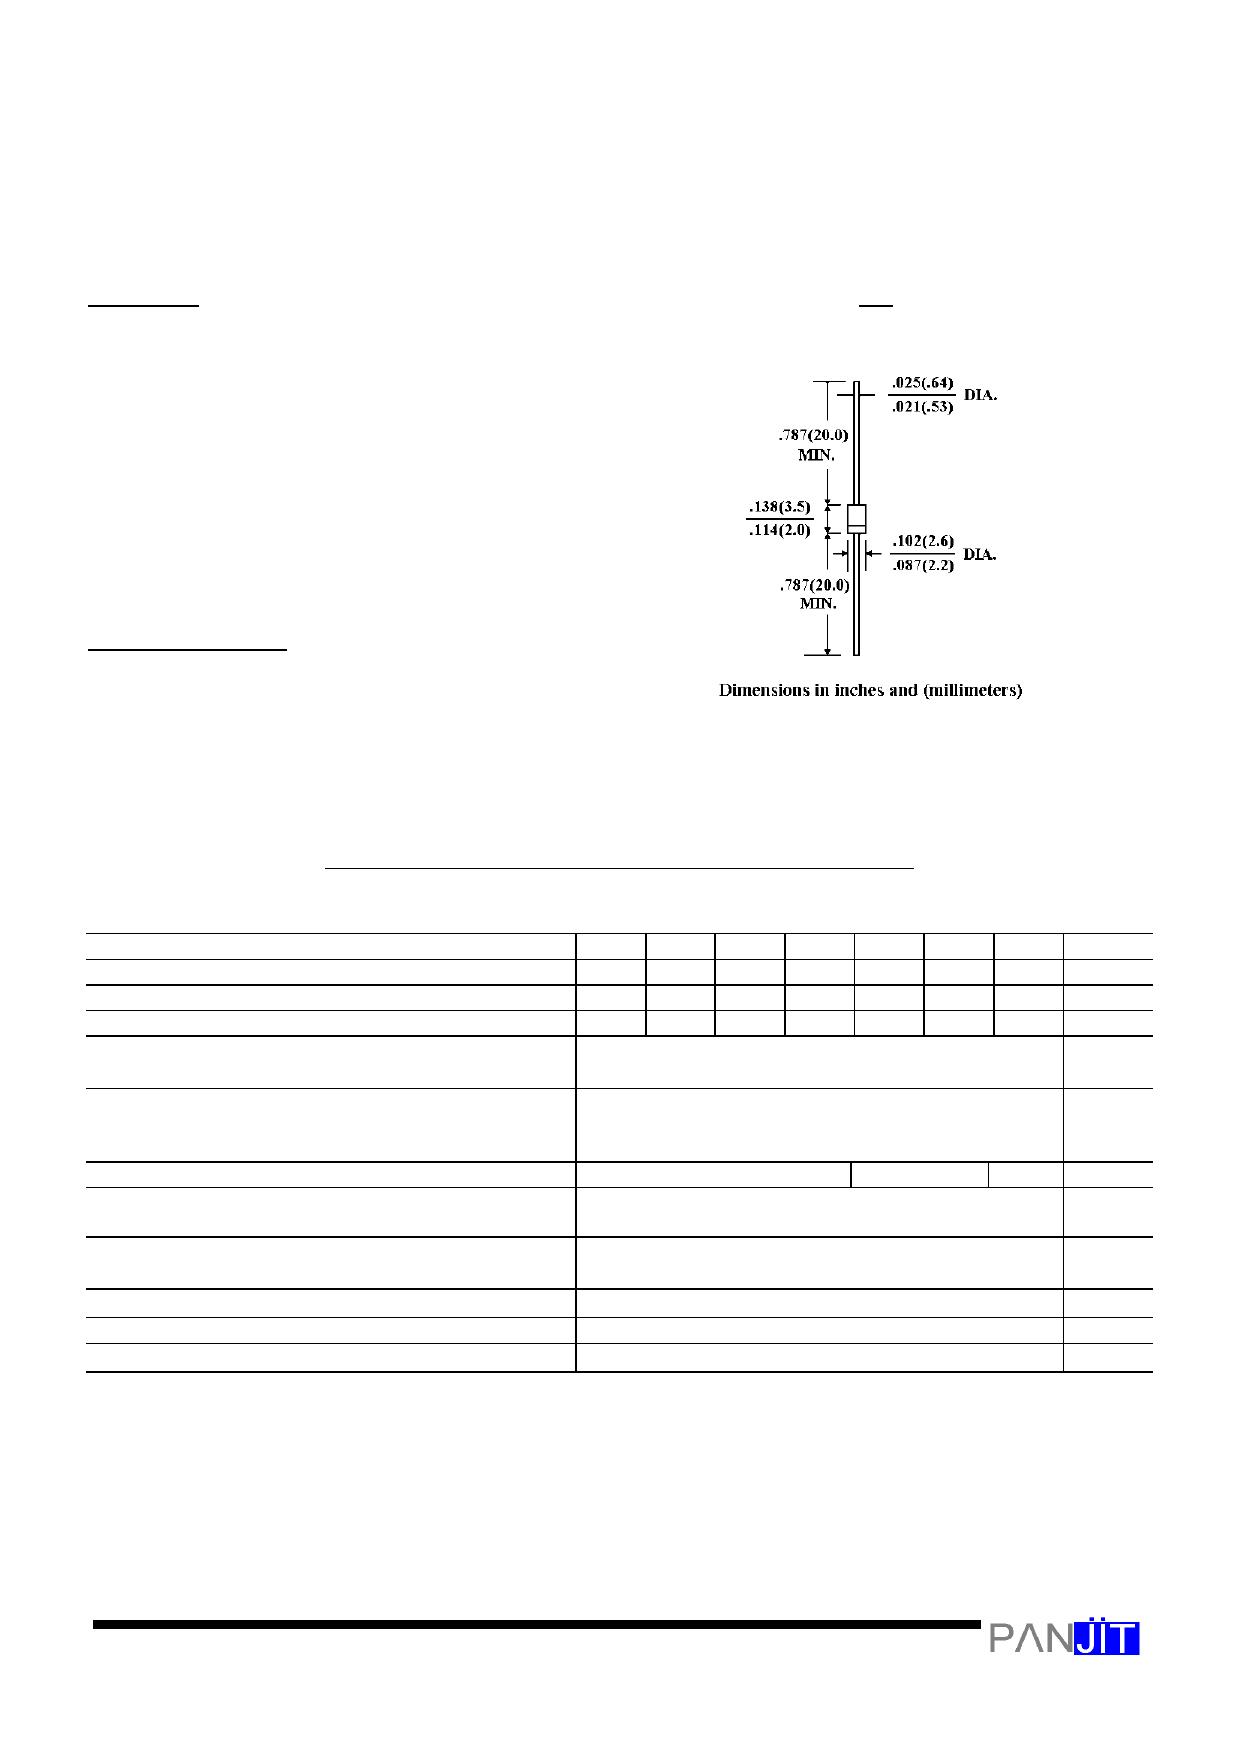 1.00E+03 datasheet